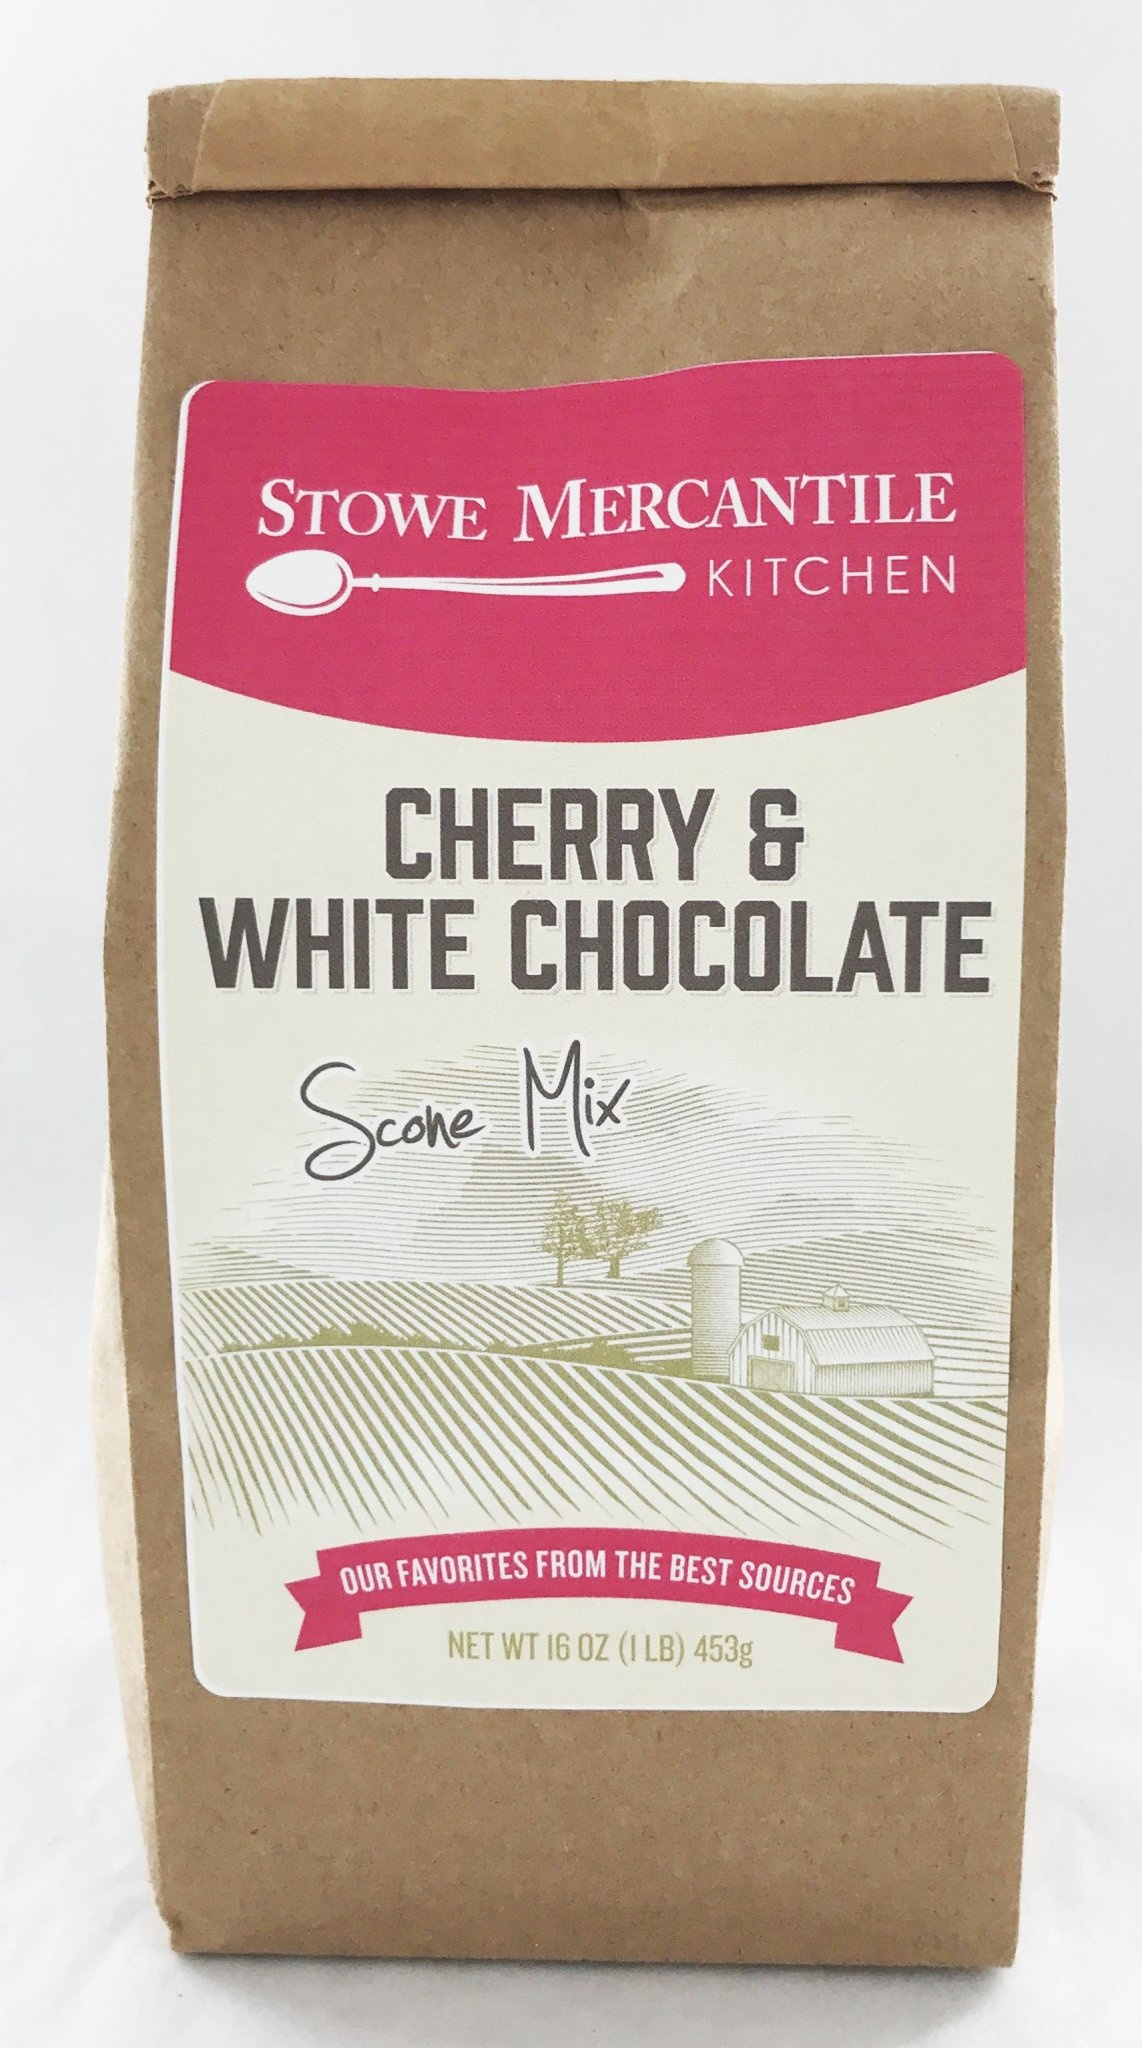 Stowe Mercantile Kitchen Scone Mix - Cherry White Chocolate